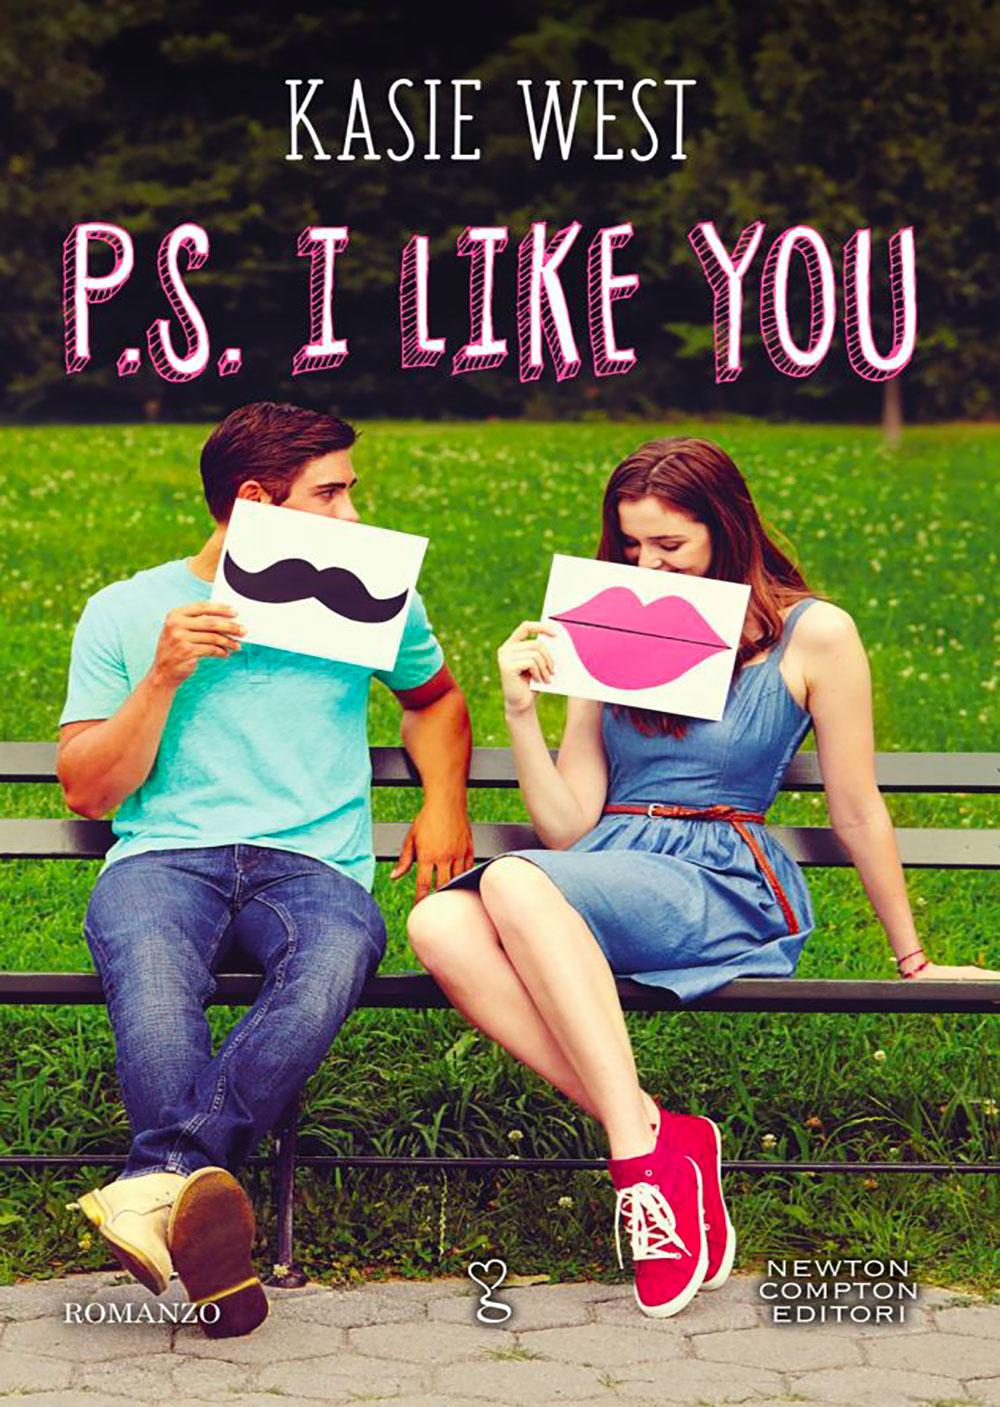 Recensioni 2017: P.S. I like you